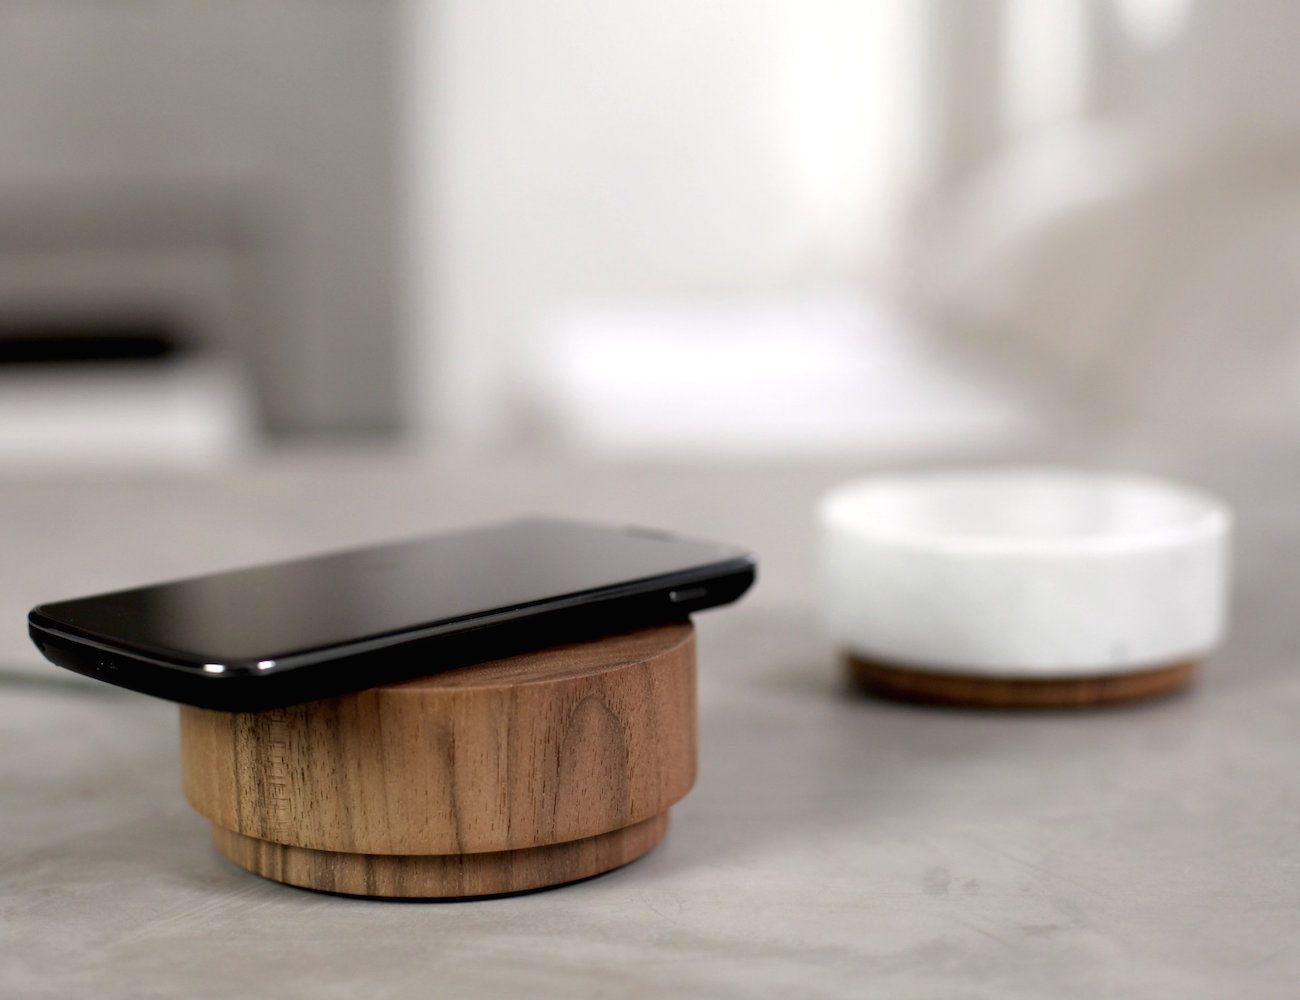 Pebble 2 #WirelessCharging Pad & #Speakers  Beautiful wooden design for your #workspace!